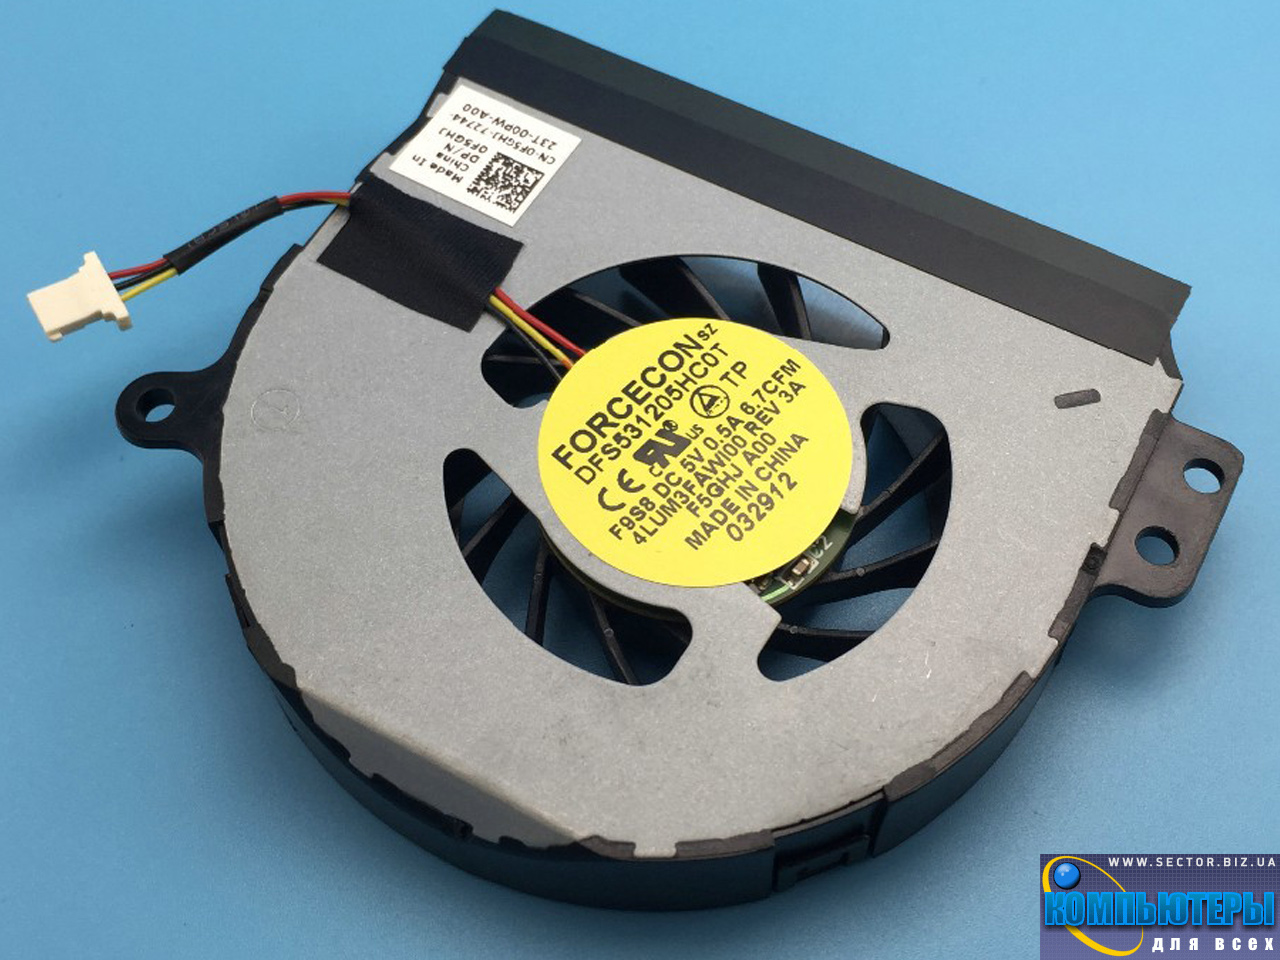 Кулер к ноутбуку Dell Inspiron 1464 1564 1764 P07E P08F P09G p/n: DFS531205HC0T F9S8. Фото № 2.